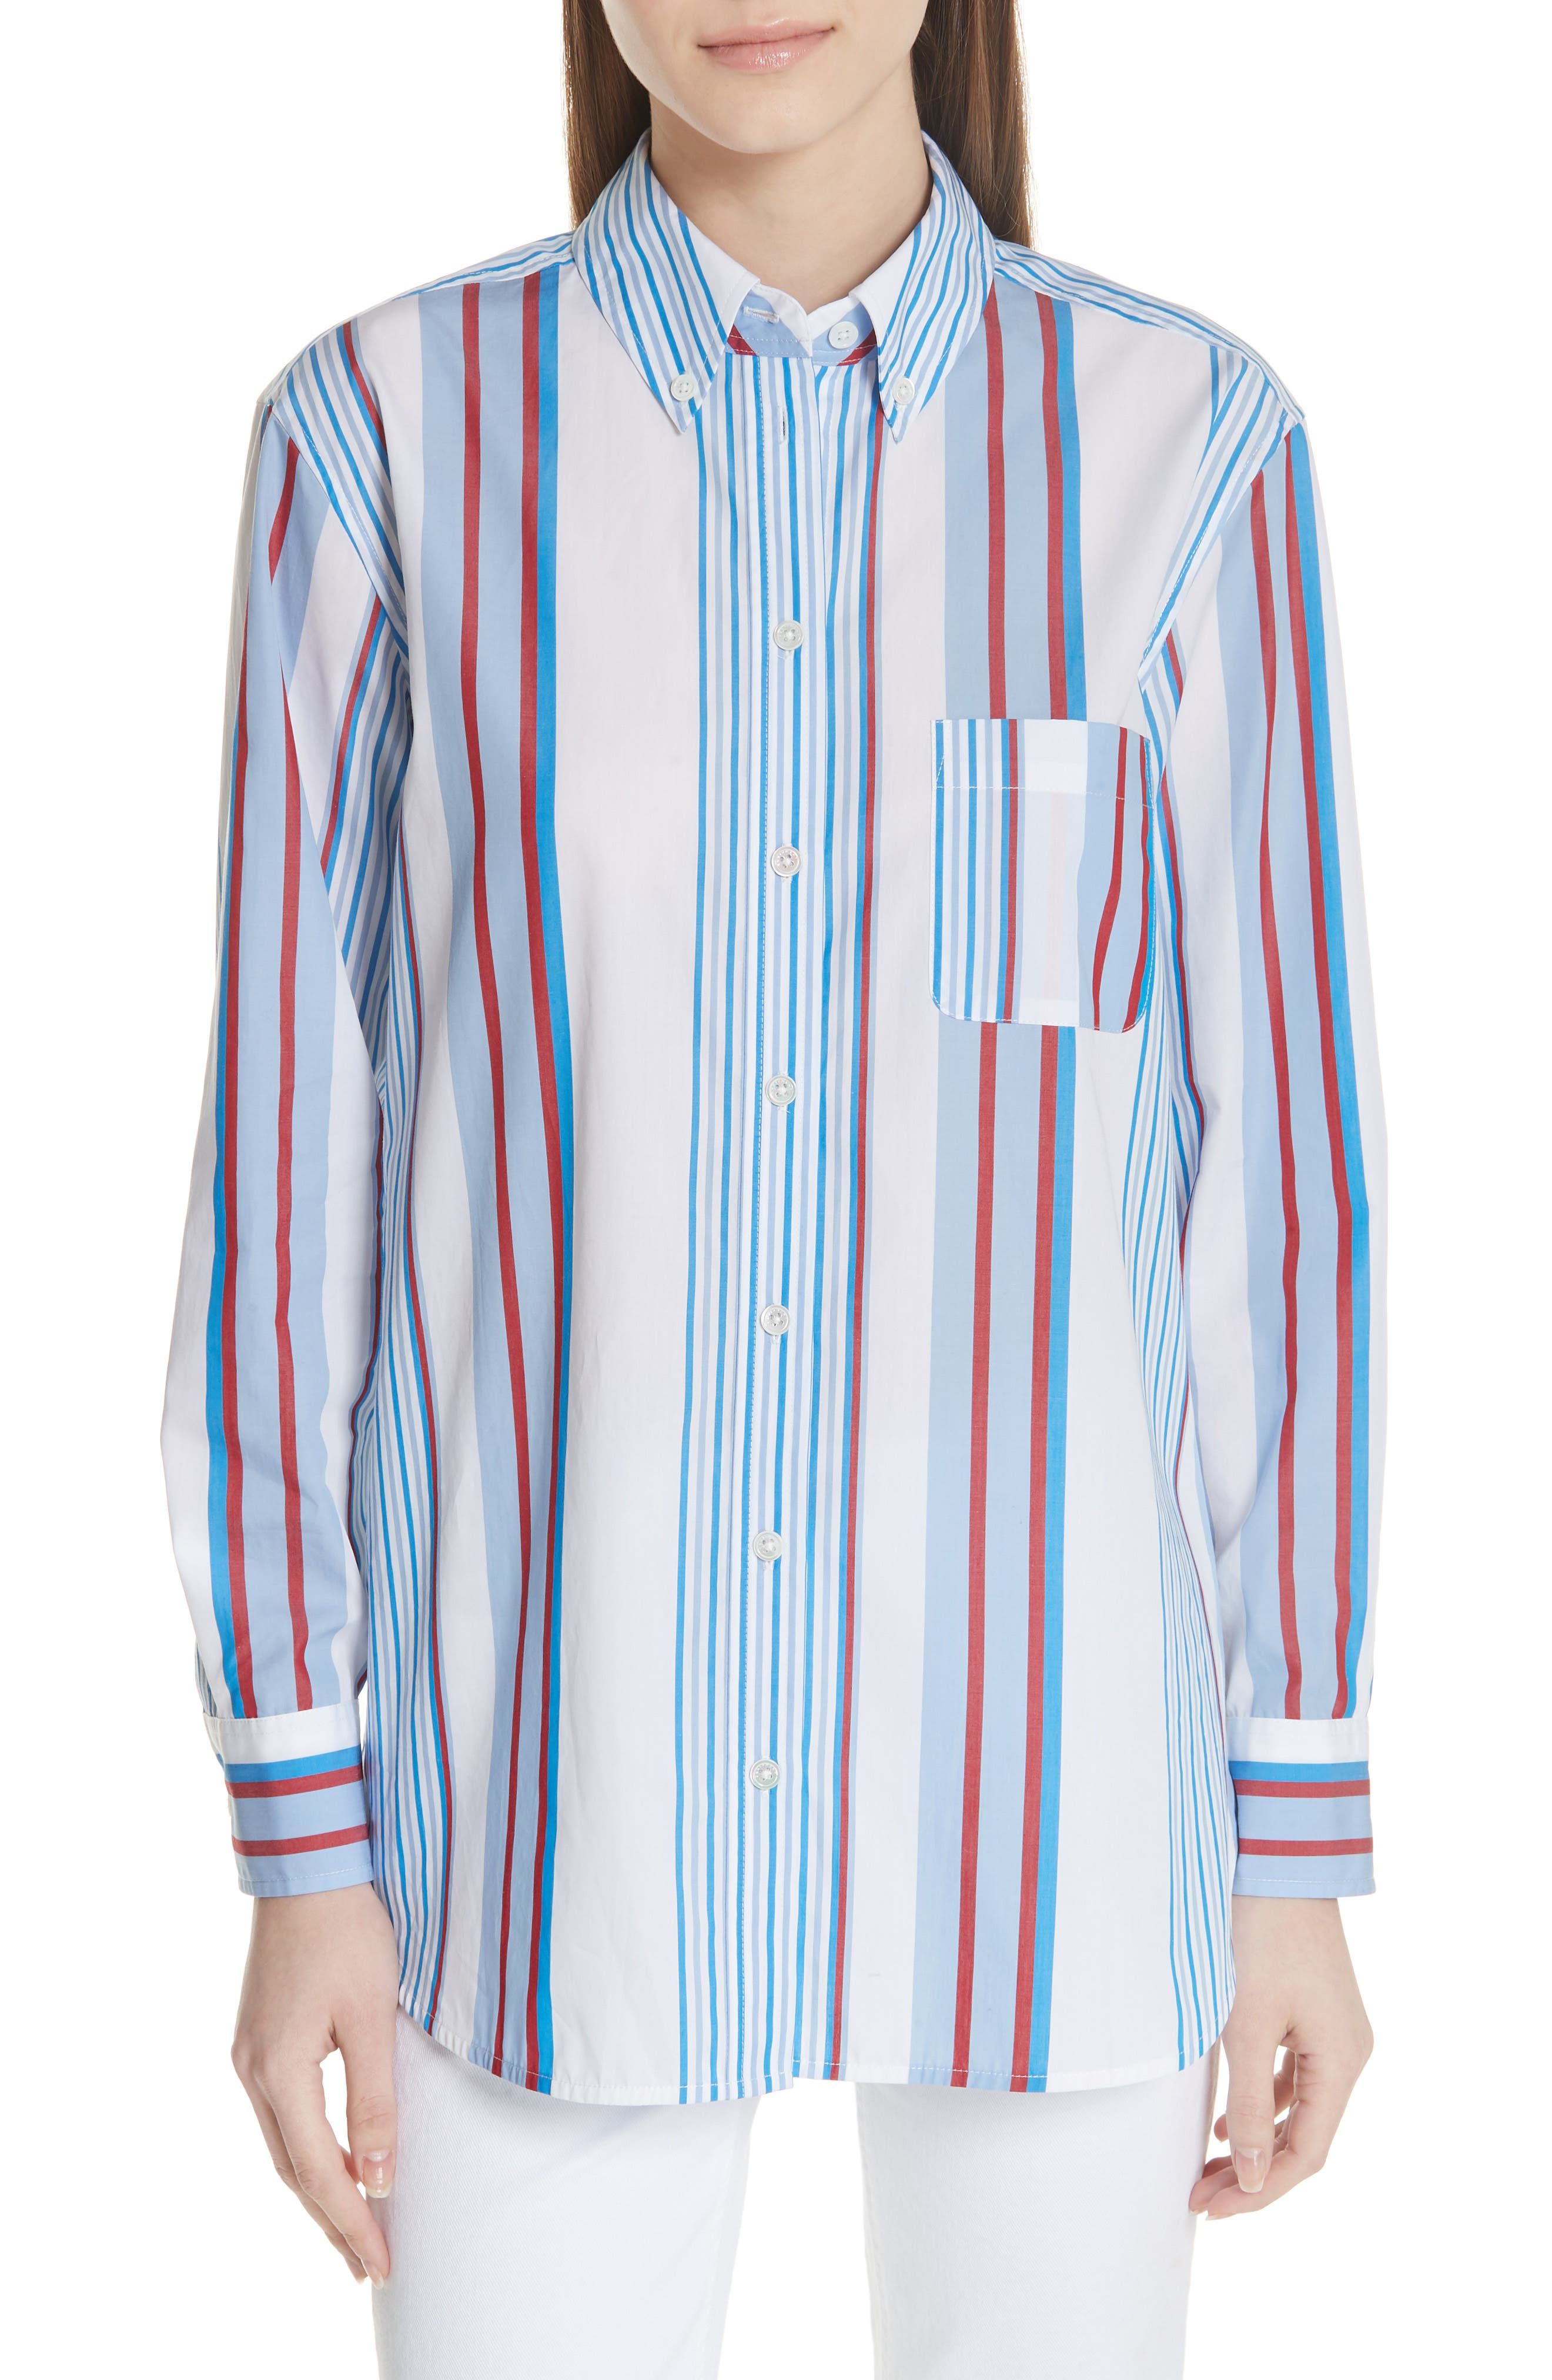 Margaux Stripe Shirt,                         Main,                         color, BLUE WHITE MULTI